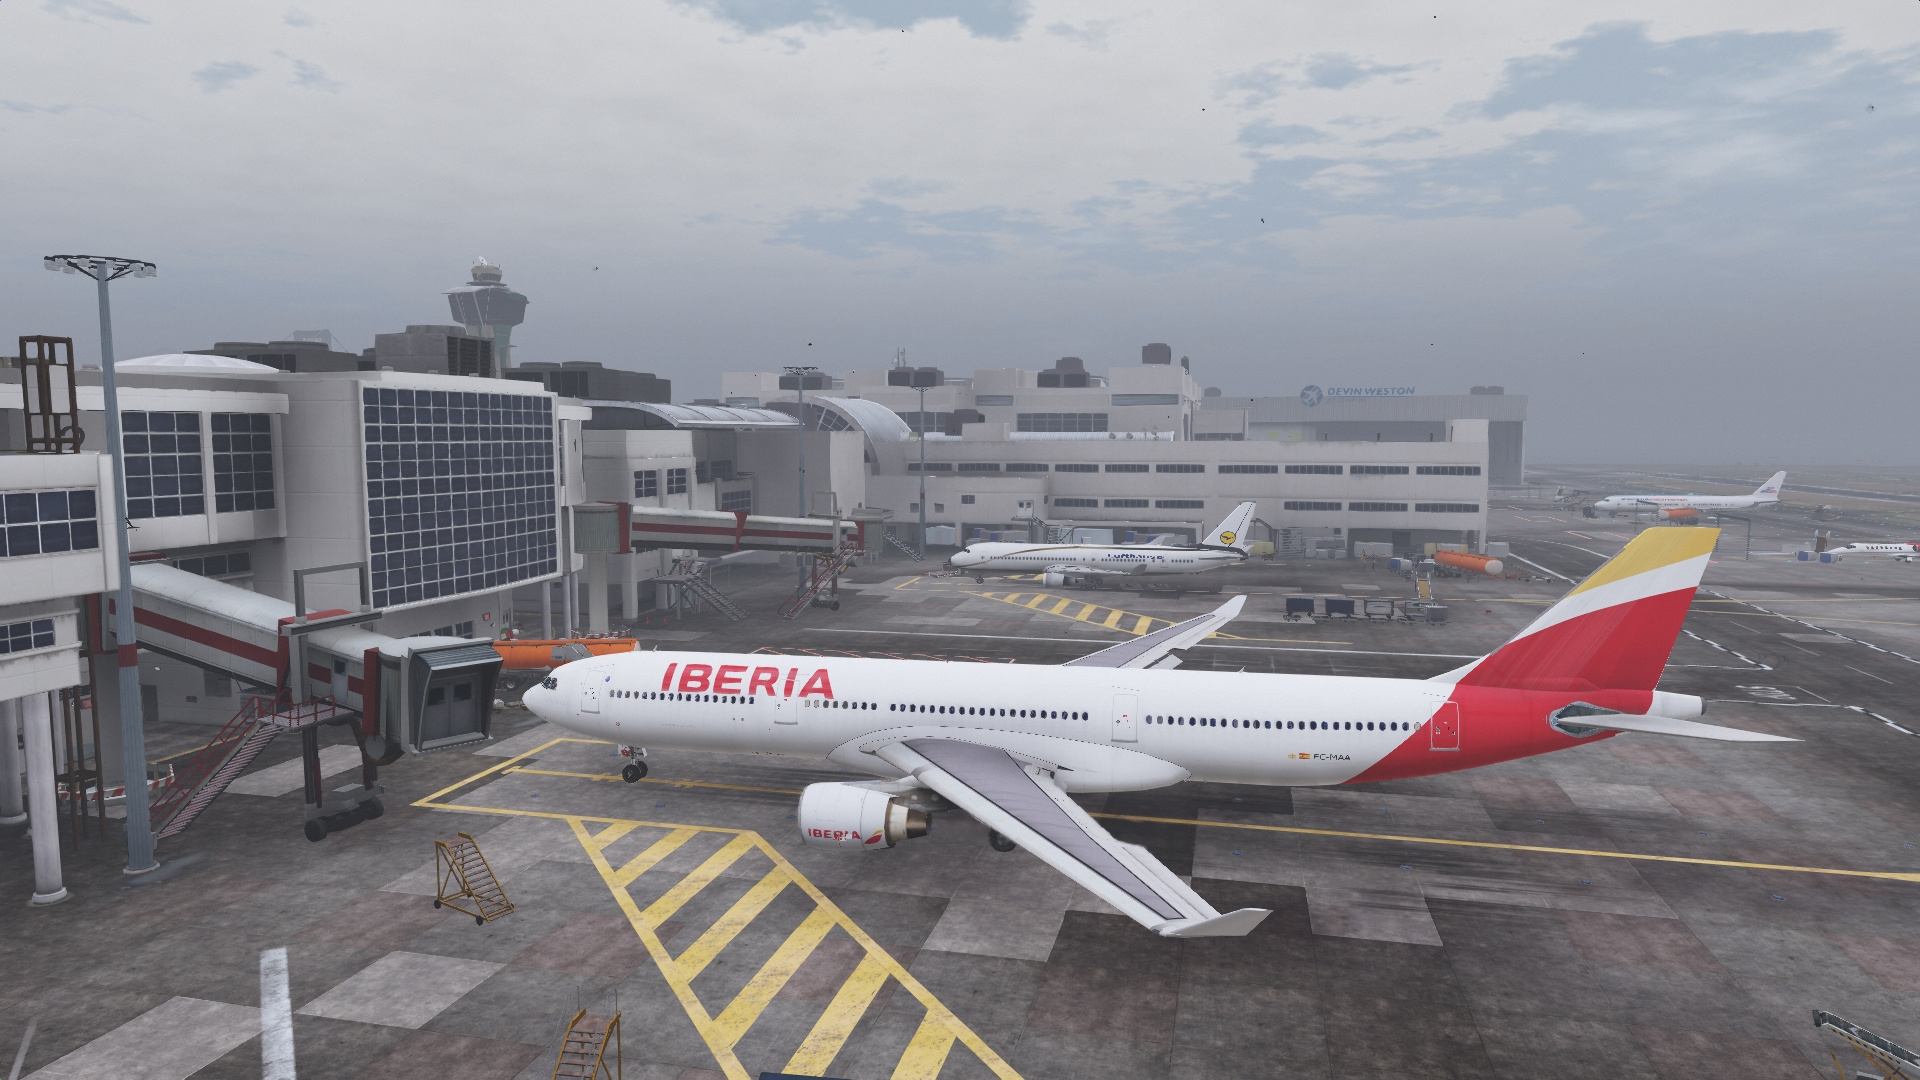 Thefts in Aeroflot 84